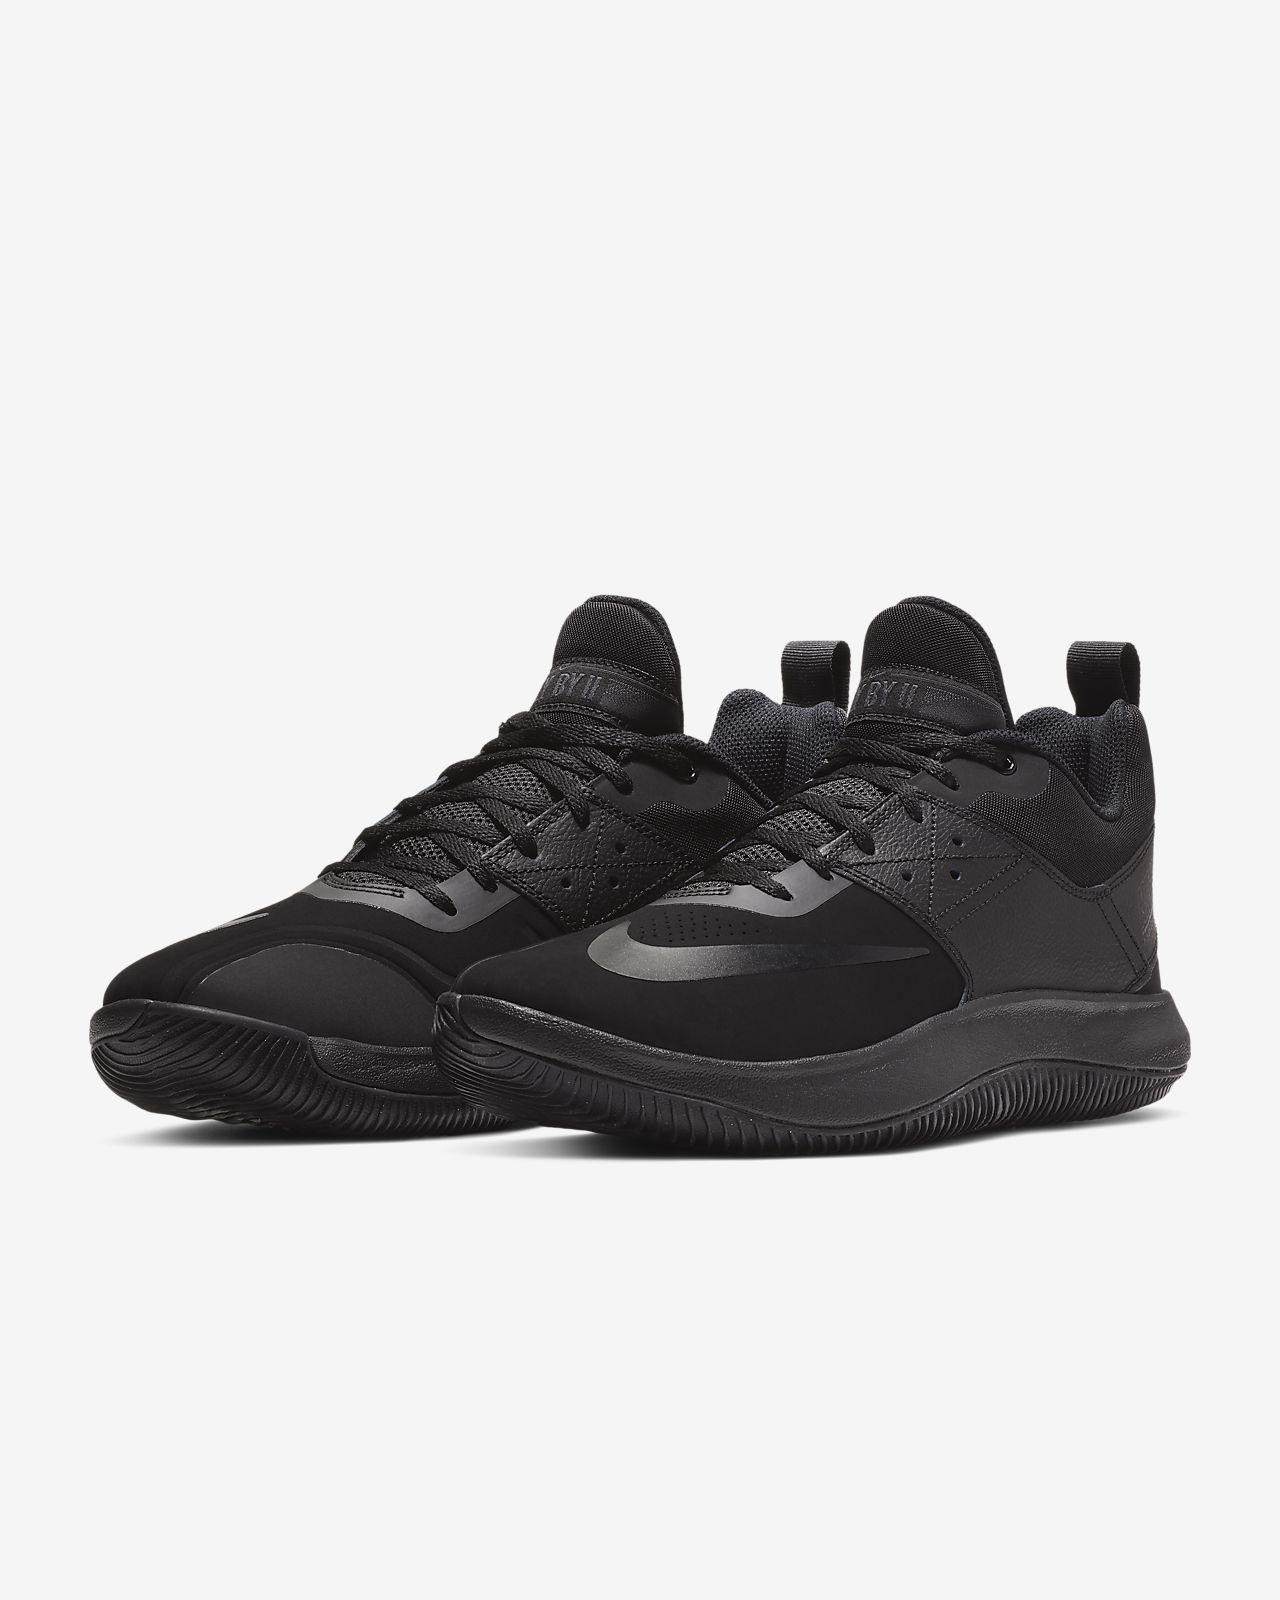 cb4f5a126444d By Low II NBK Men's Basketball Shoe Nike Fly.By Low II NBK Men's Basketball  Shoe